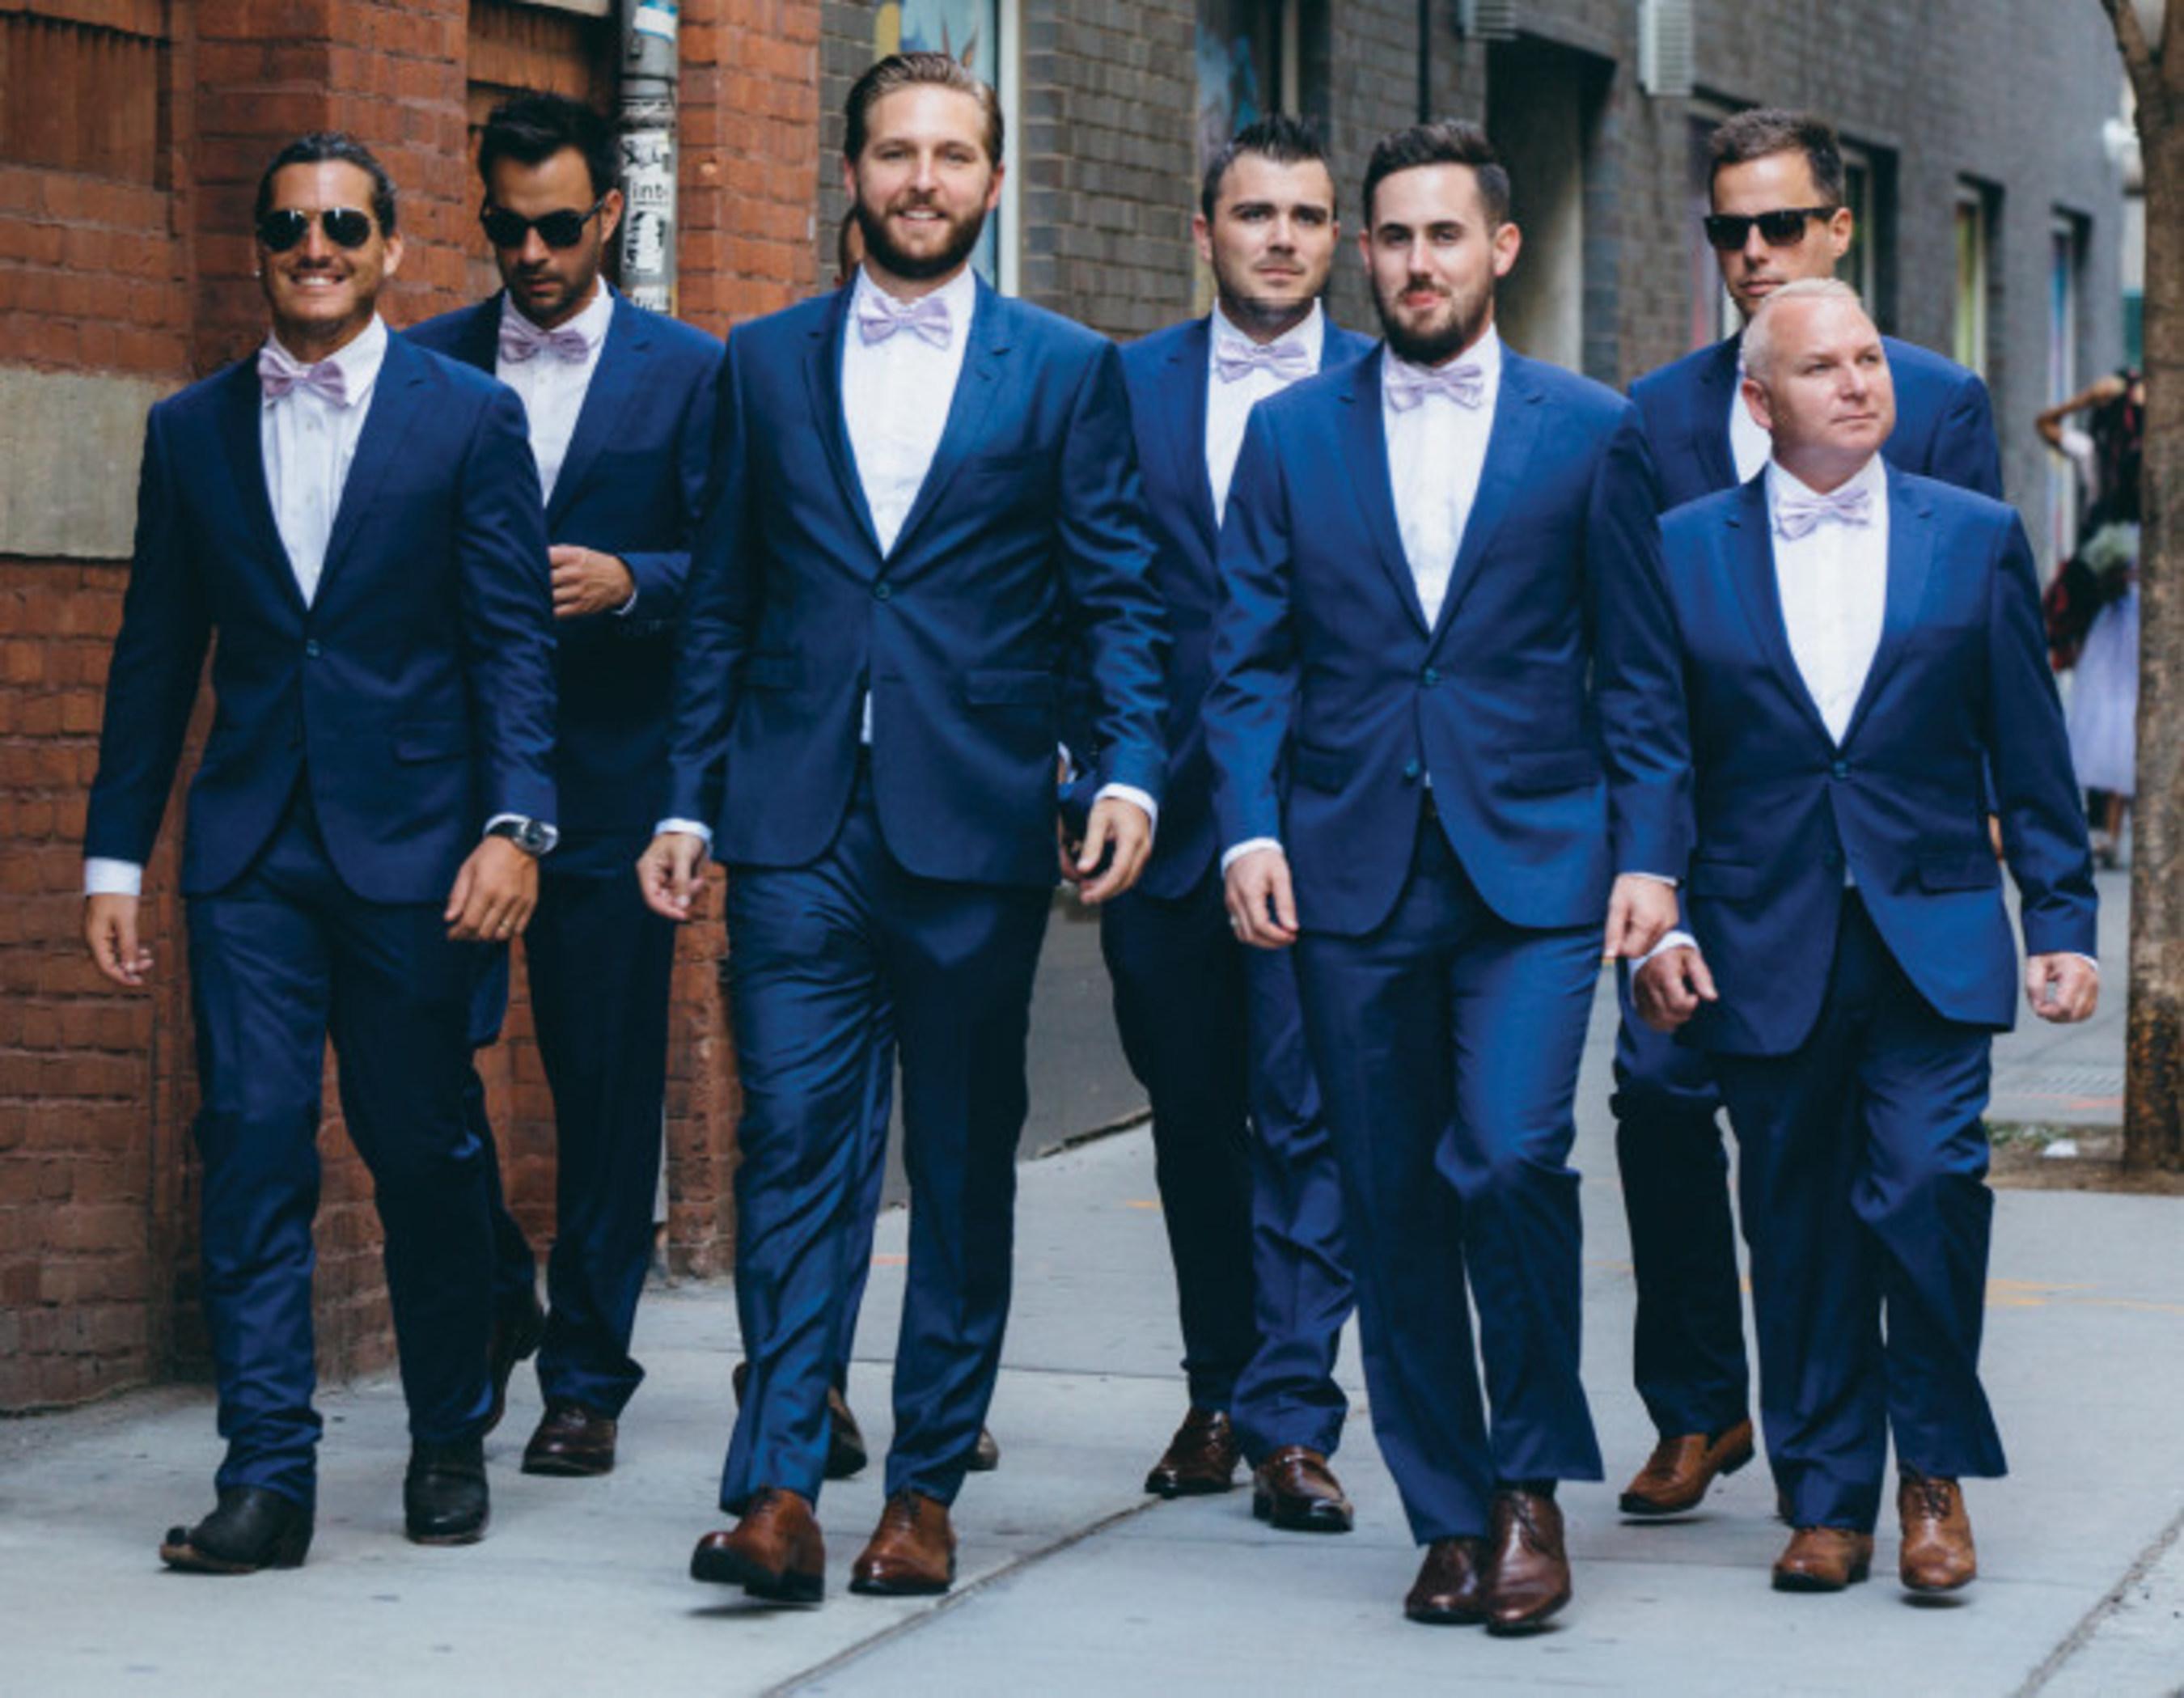 the groomsman suit launching kickstarter campaign